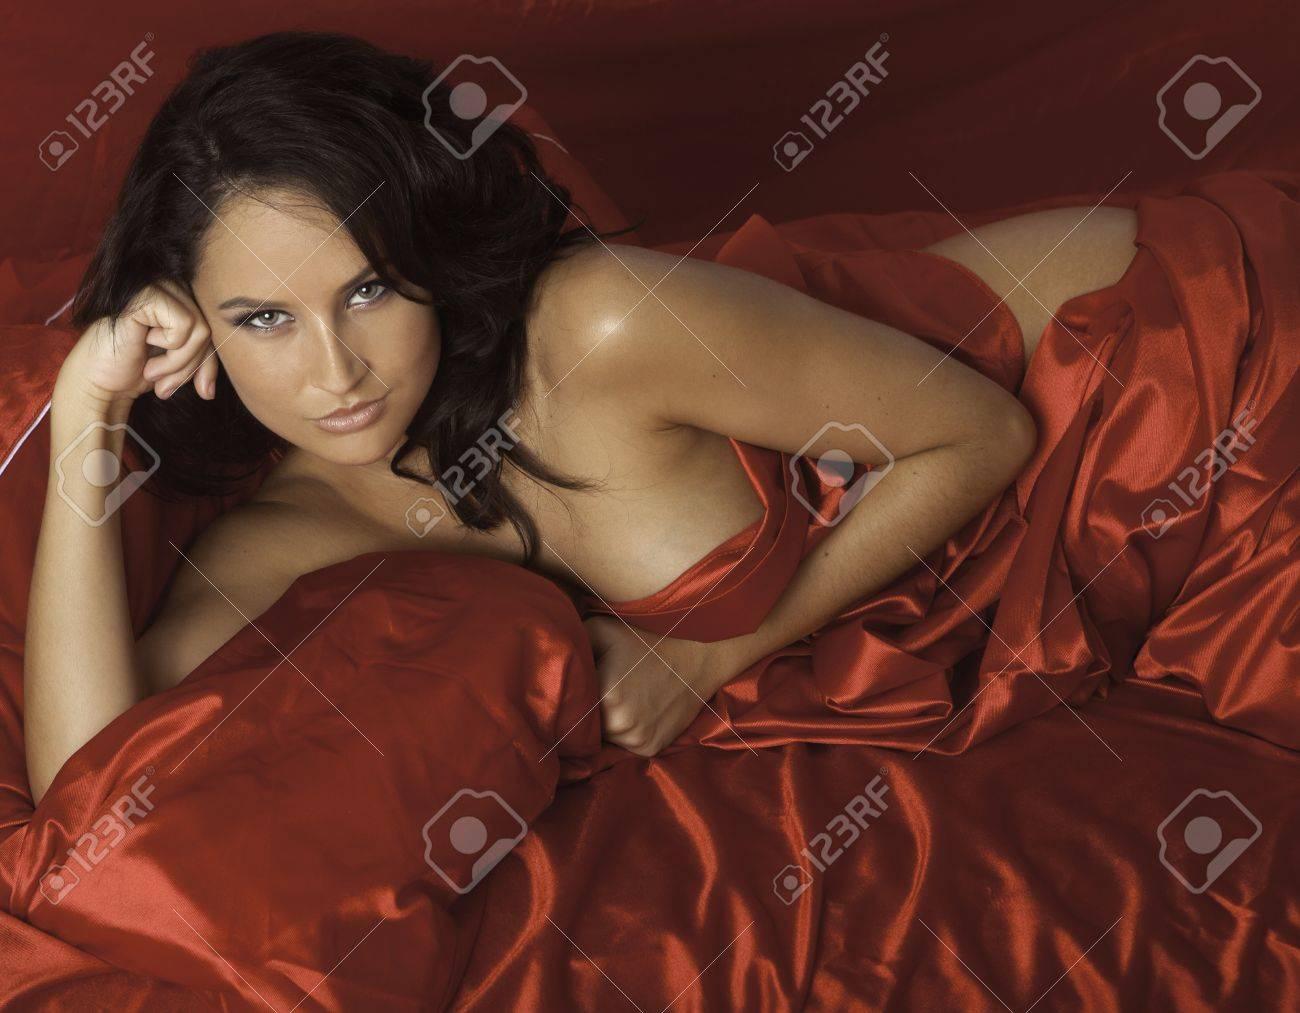 beautiful woman on red satin sheets Stock Photo - 20570575